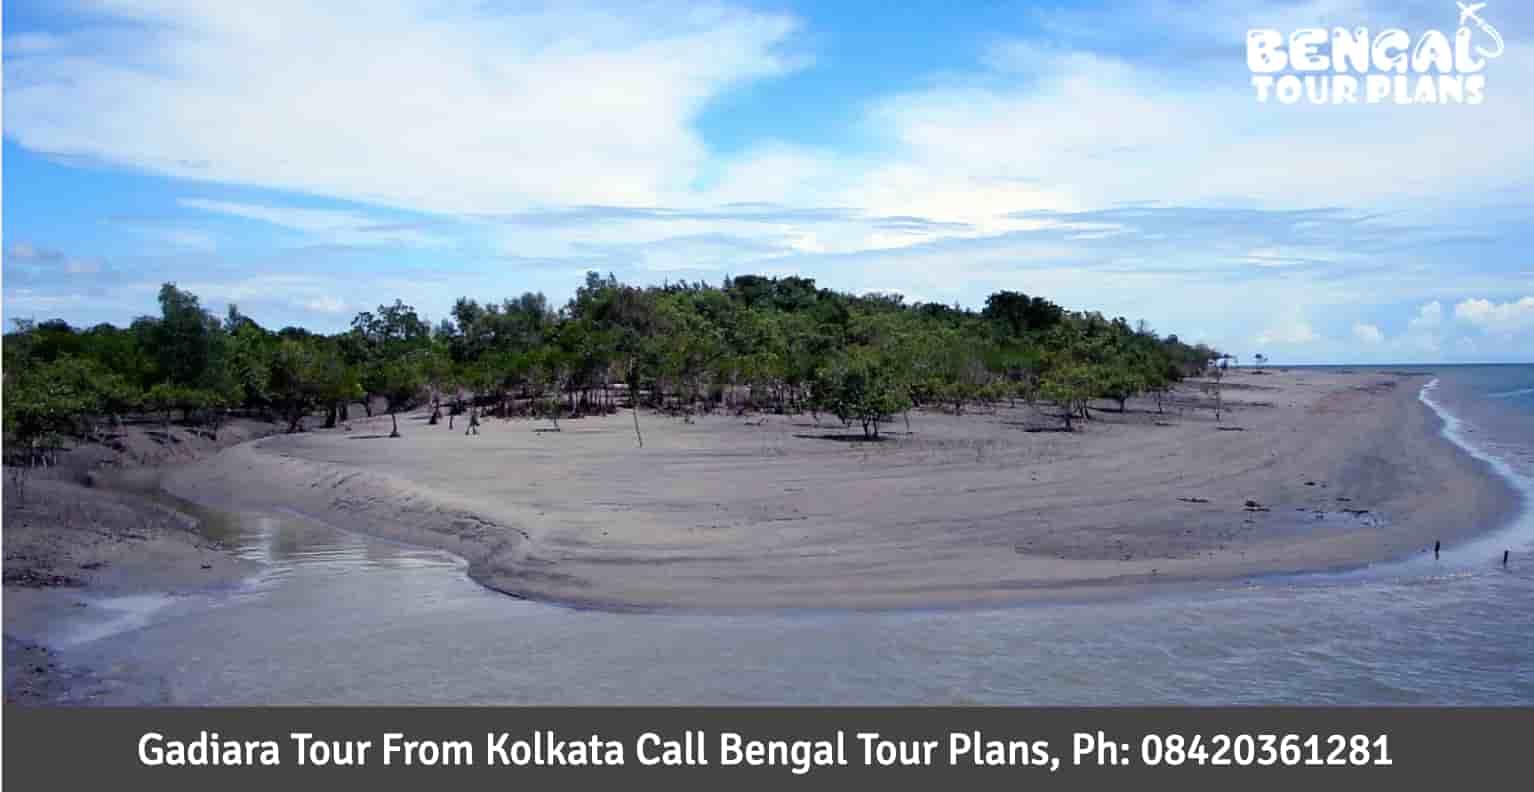 Gadiara Tour Package From Kolkata